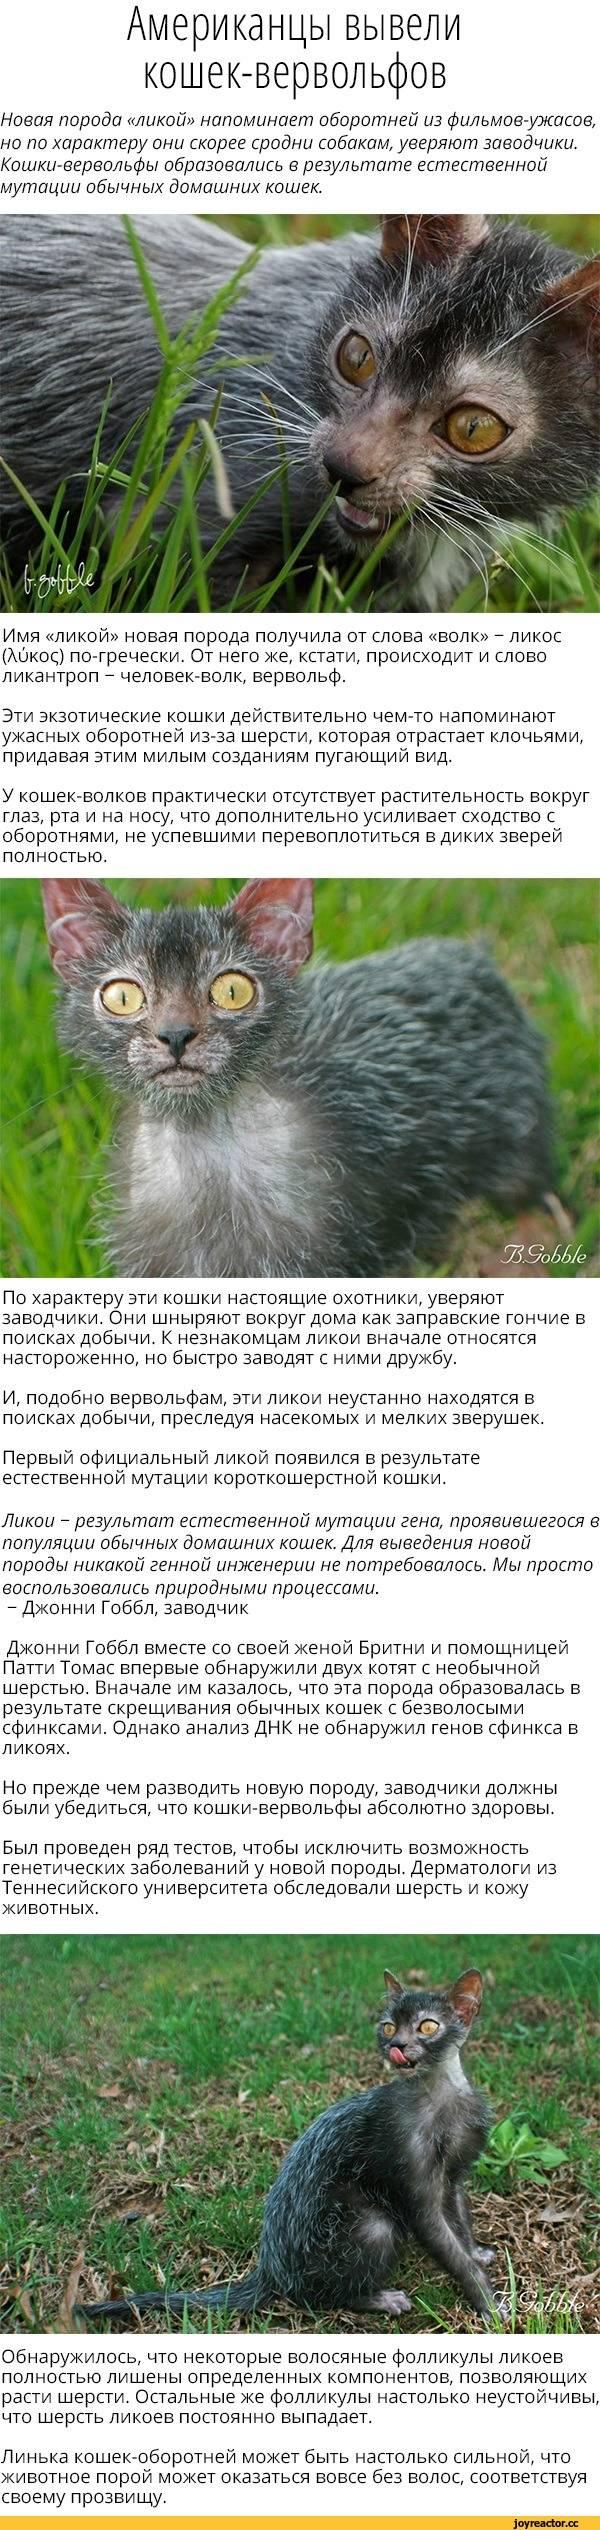 Ликой – кошка-оборотень